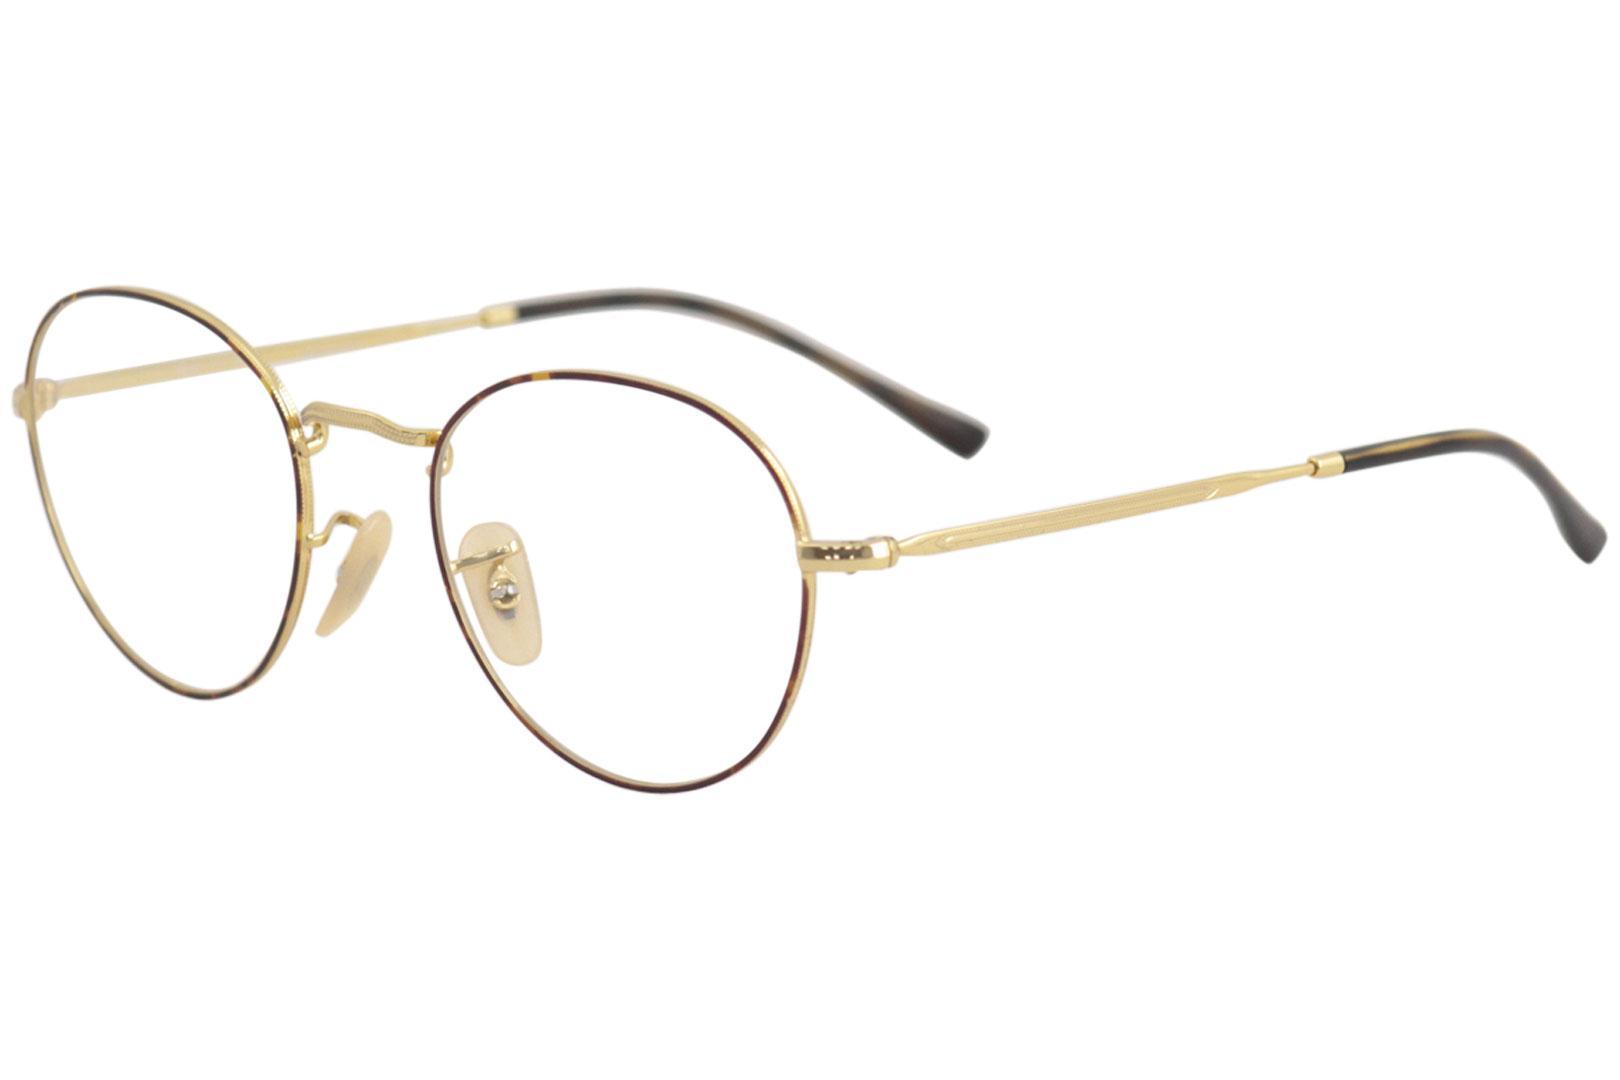 232db0cf28 Ray Ban Eyeglasses RB3582V RX 3582 V 2945 Havana Gold RayBan Optical ...